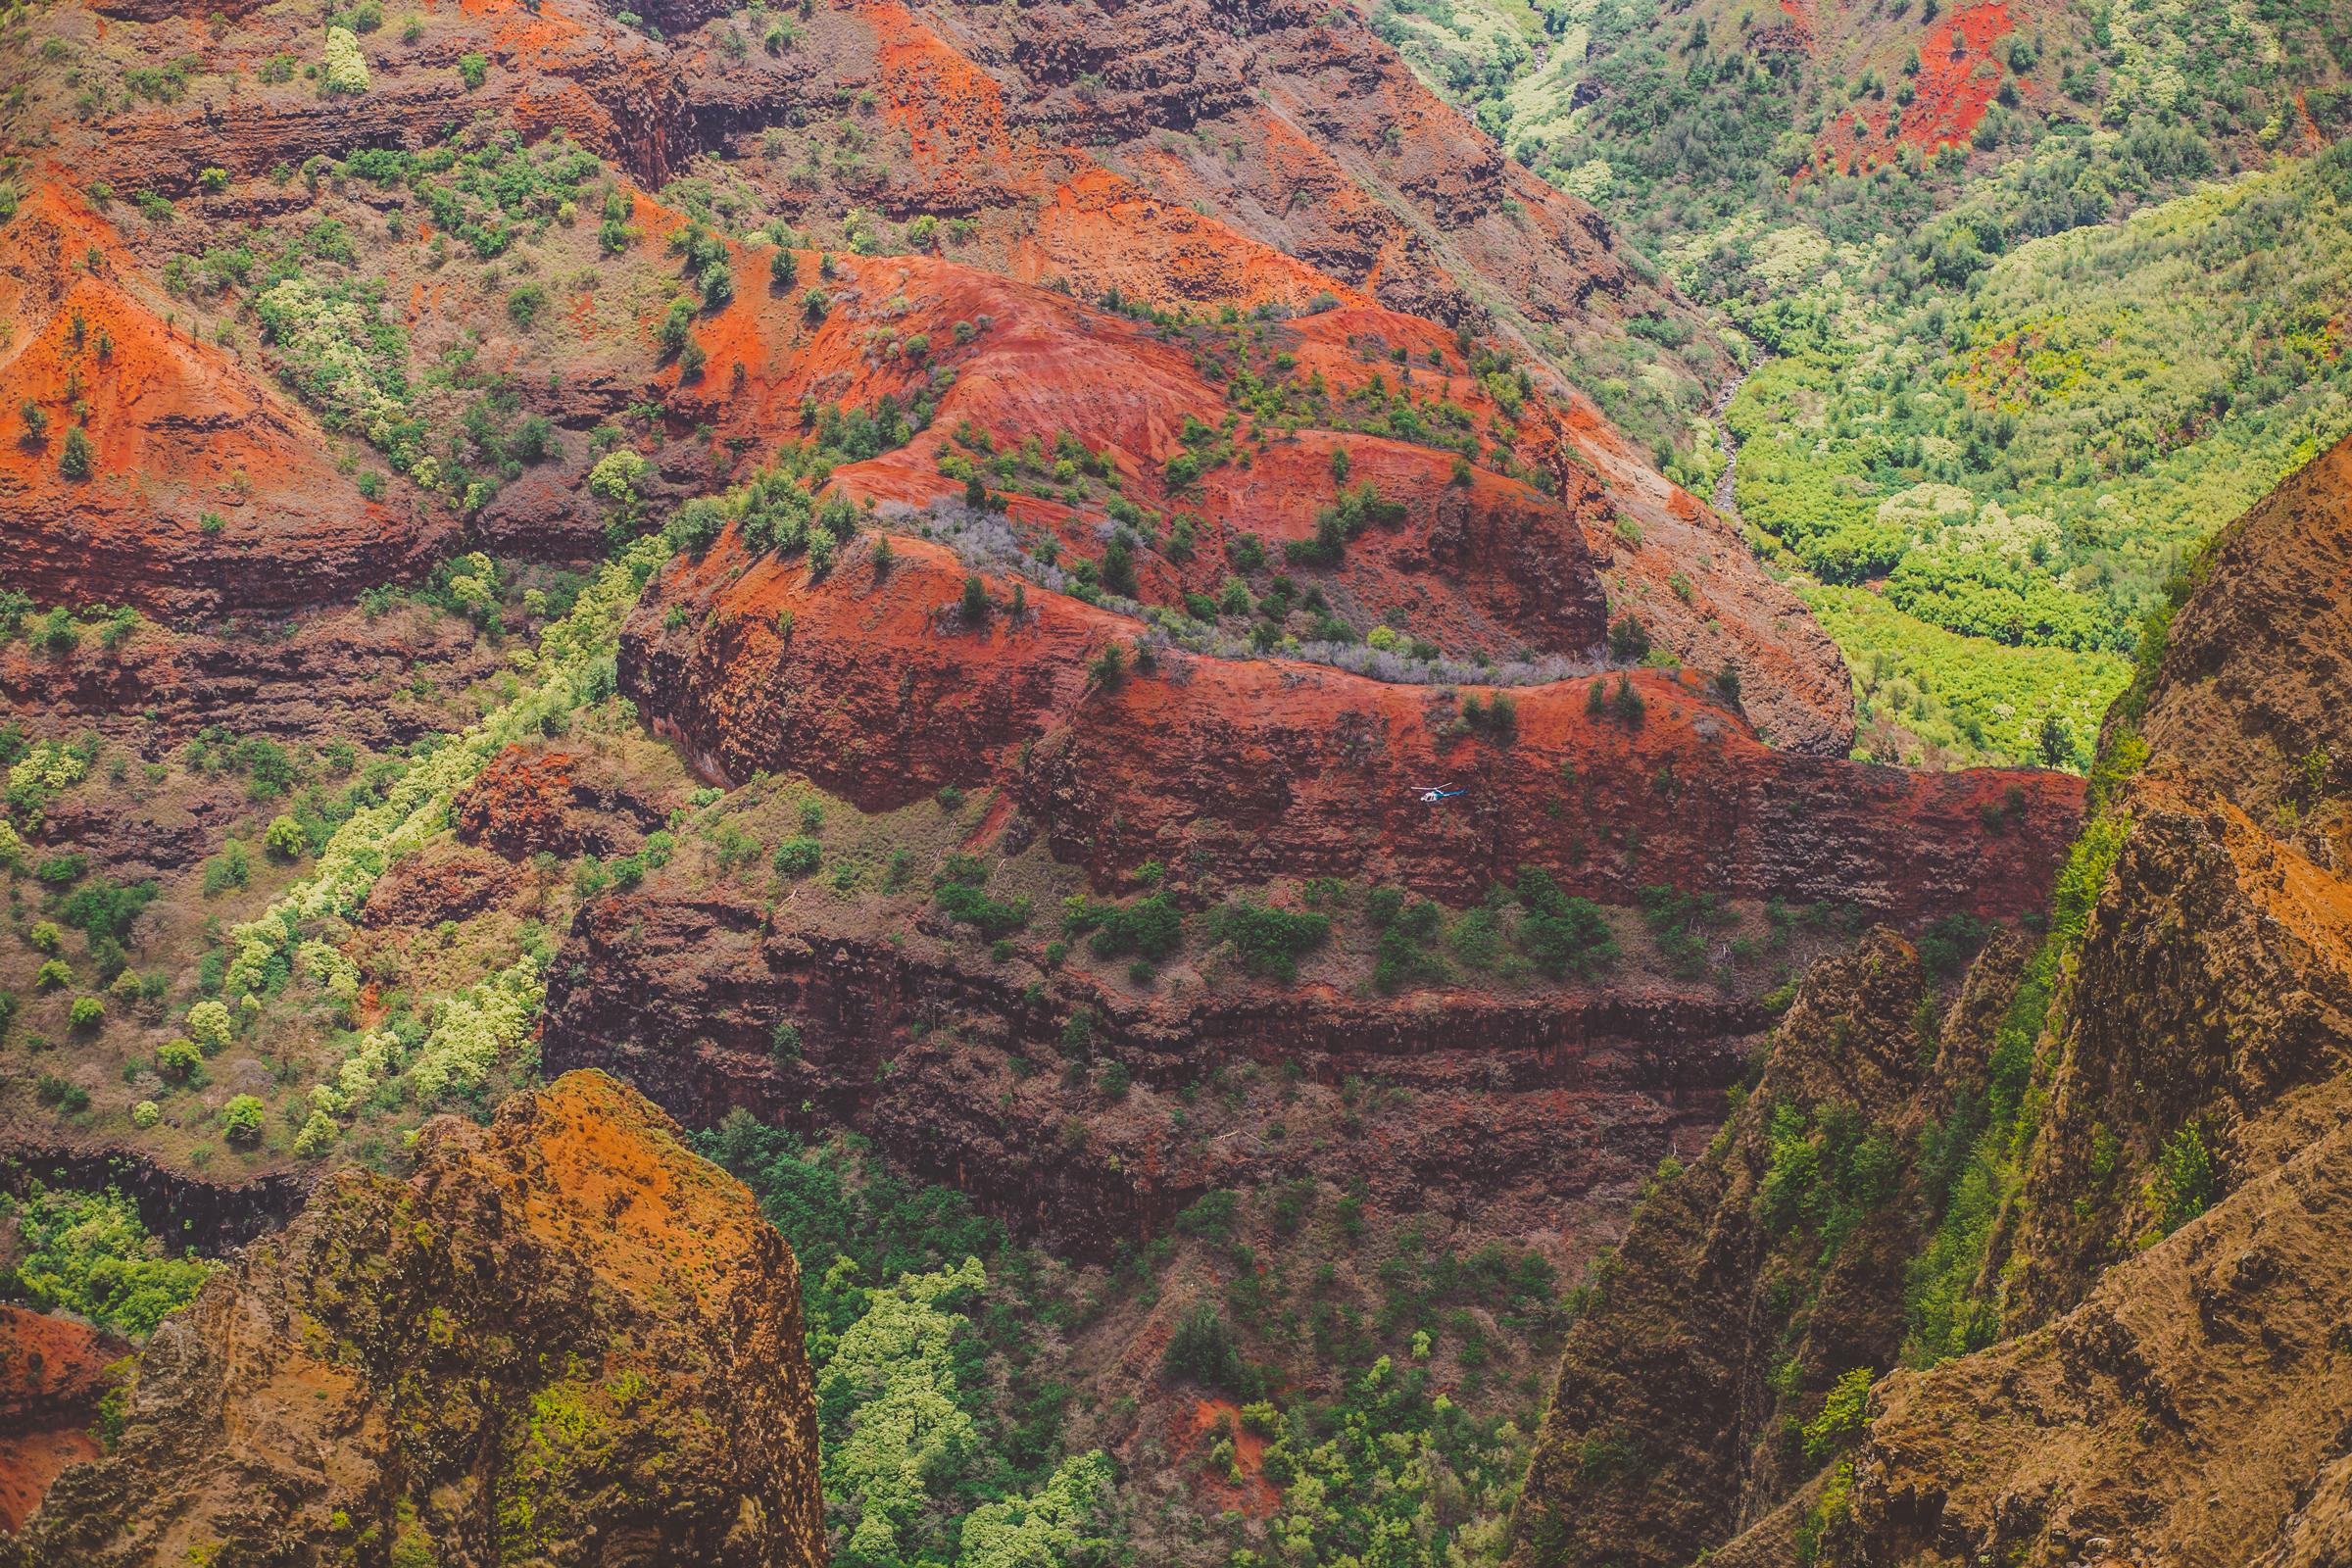 IMG_2634--KAUAI-HAWAII-JENNIFER-PICARD-PHOTOGRAPHY.jpg